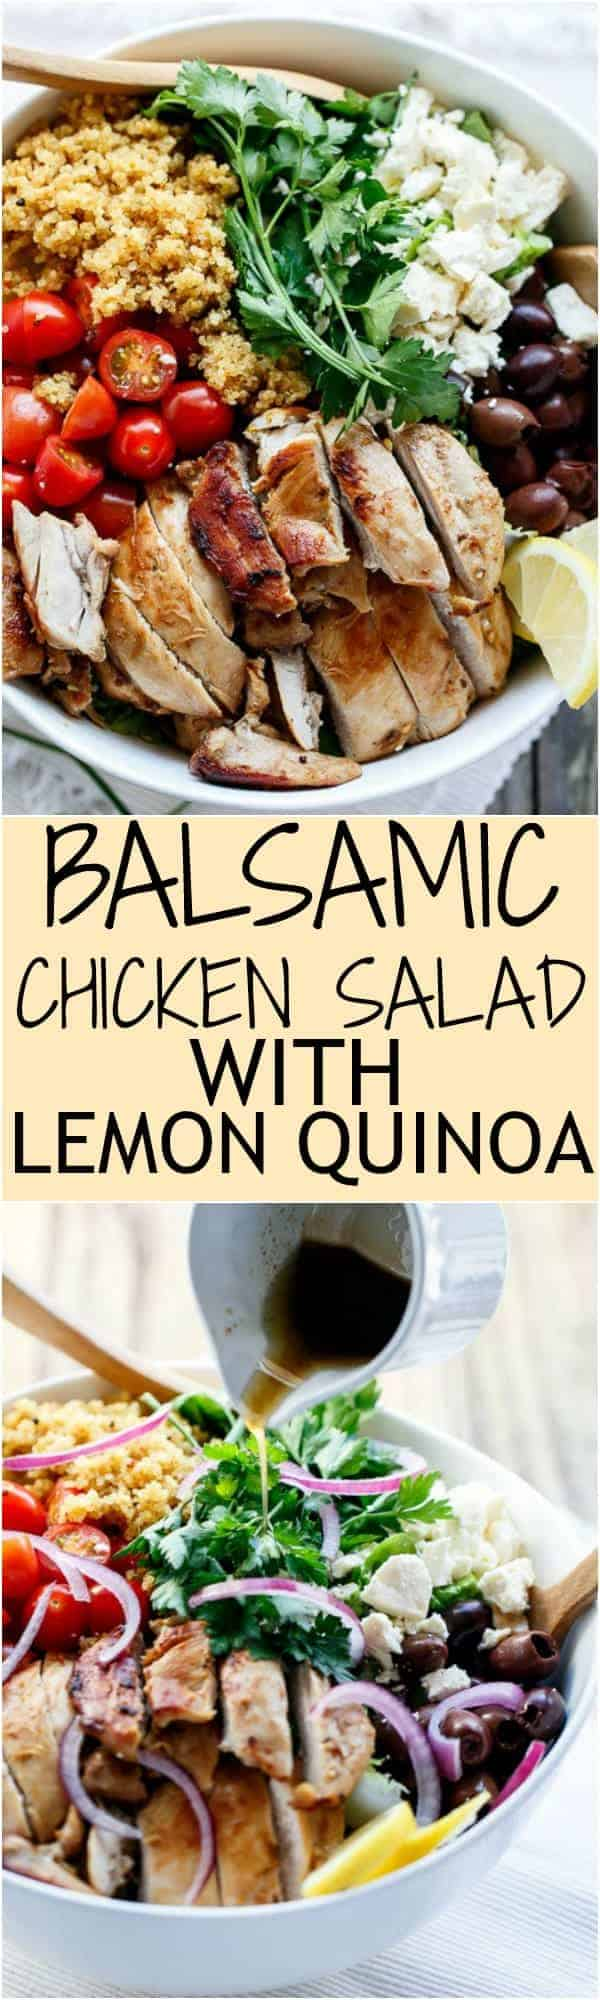 Balsamic Chicken Salad with Lemon Quinoa Collage | https://cafedelites.com